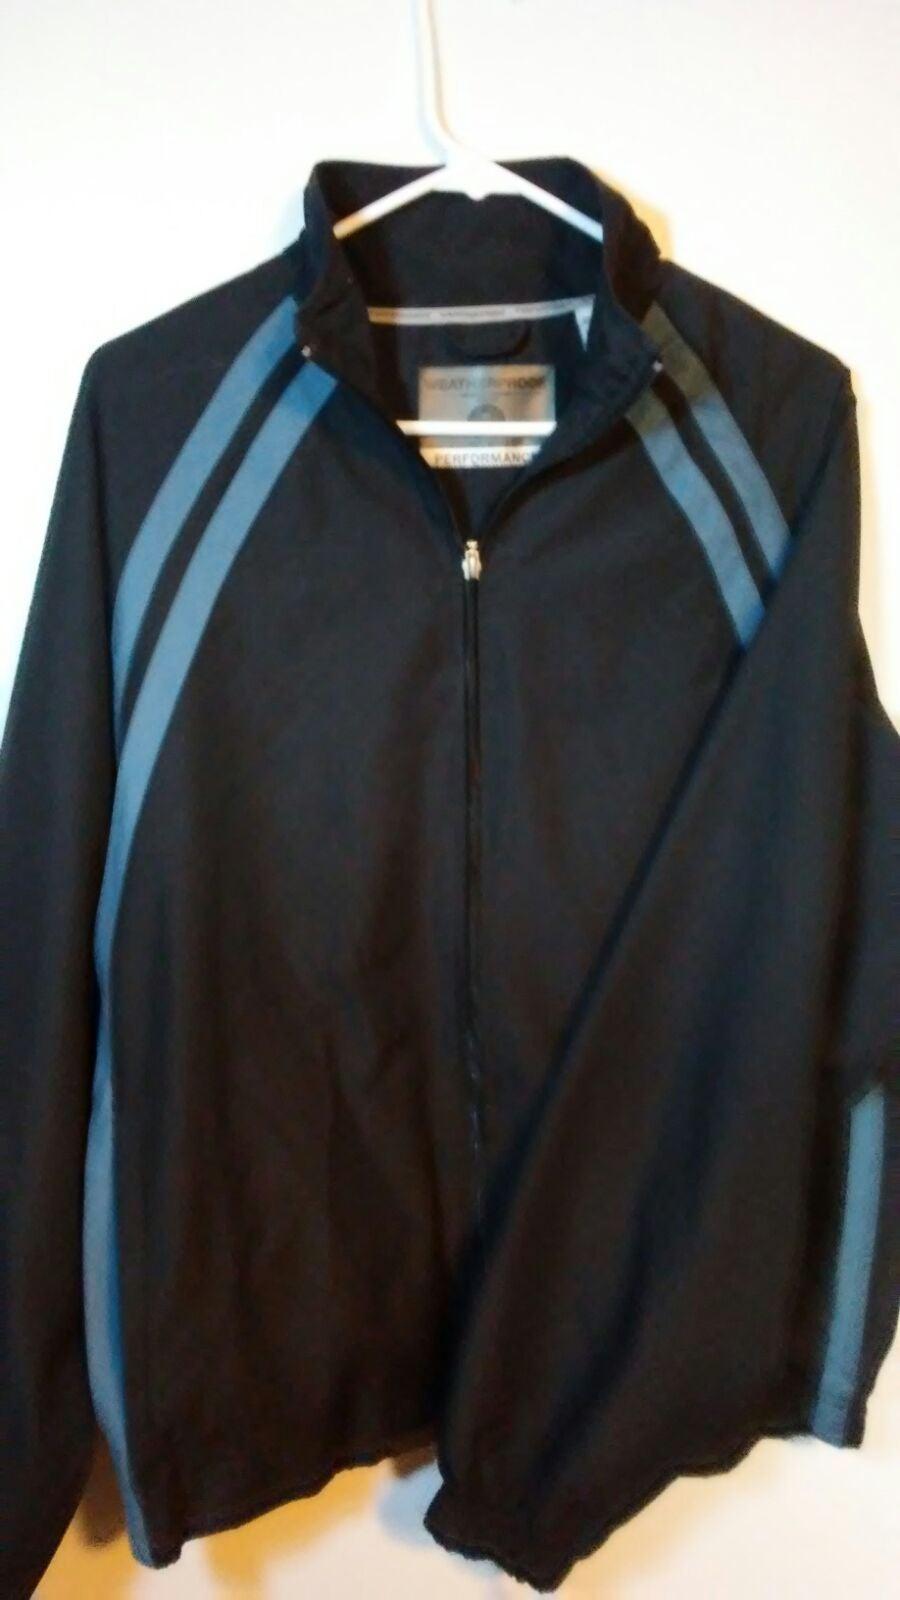 Weather Proof Jacket Garment Com.